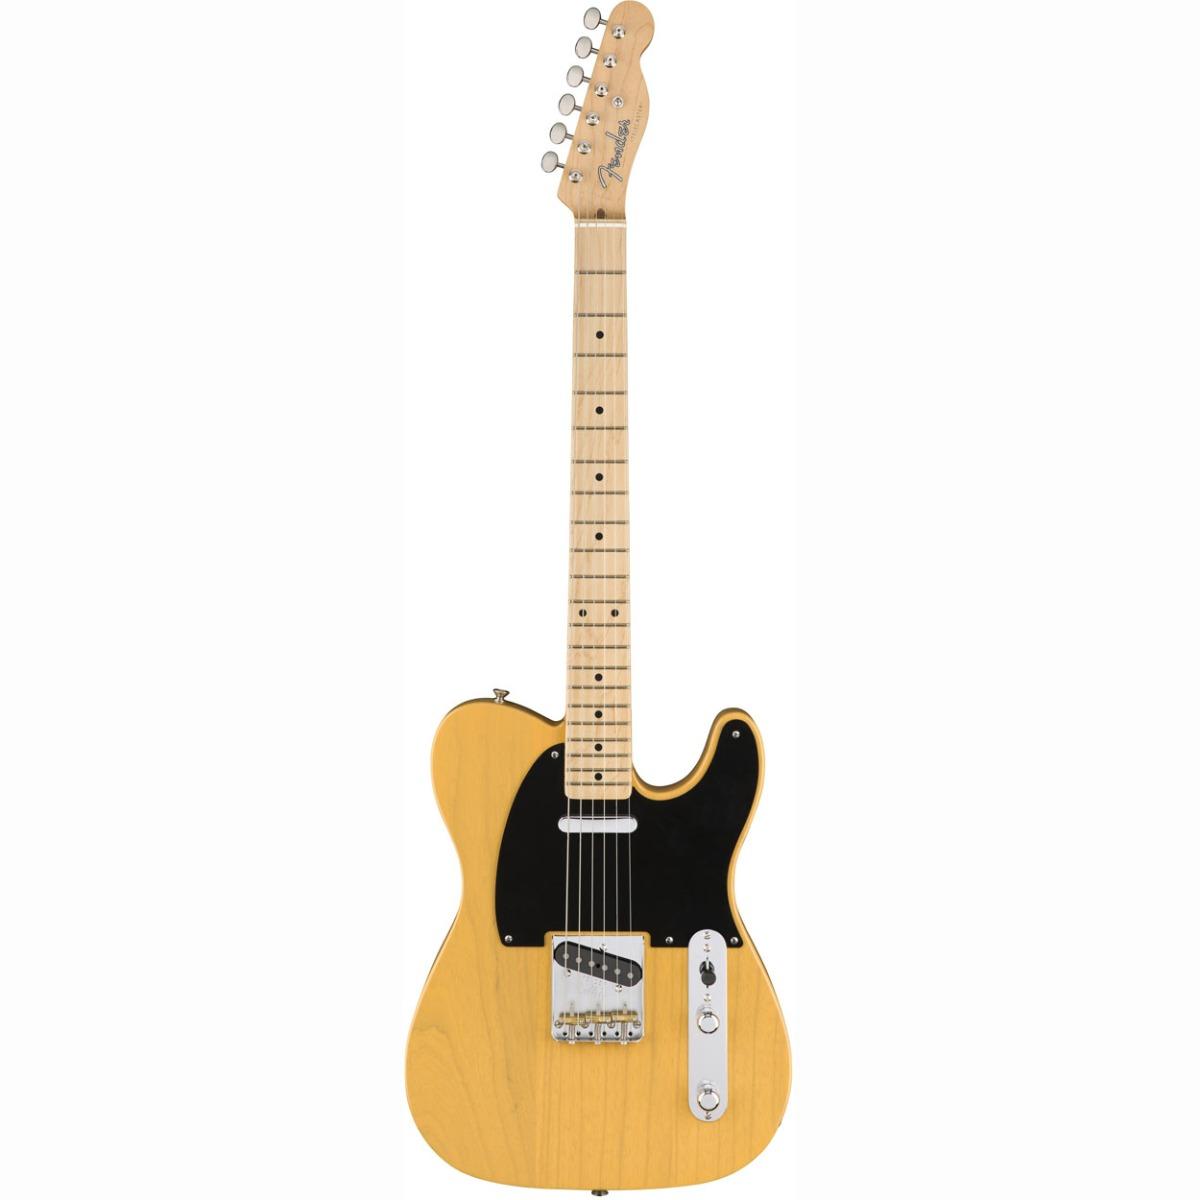 Fender American Original 50s Telecaster, MN, BTB el-guitar